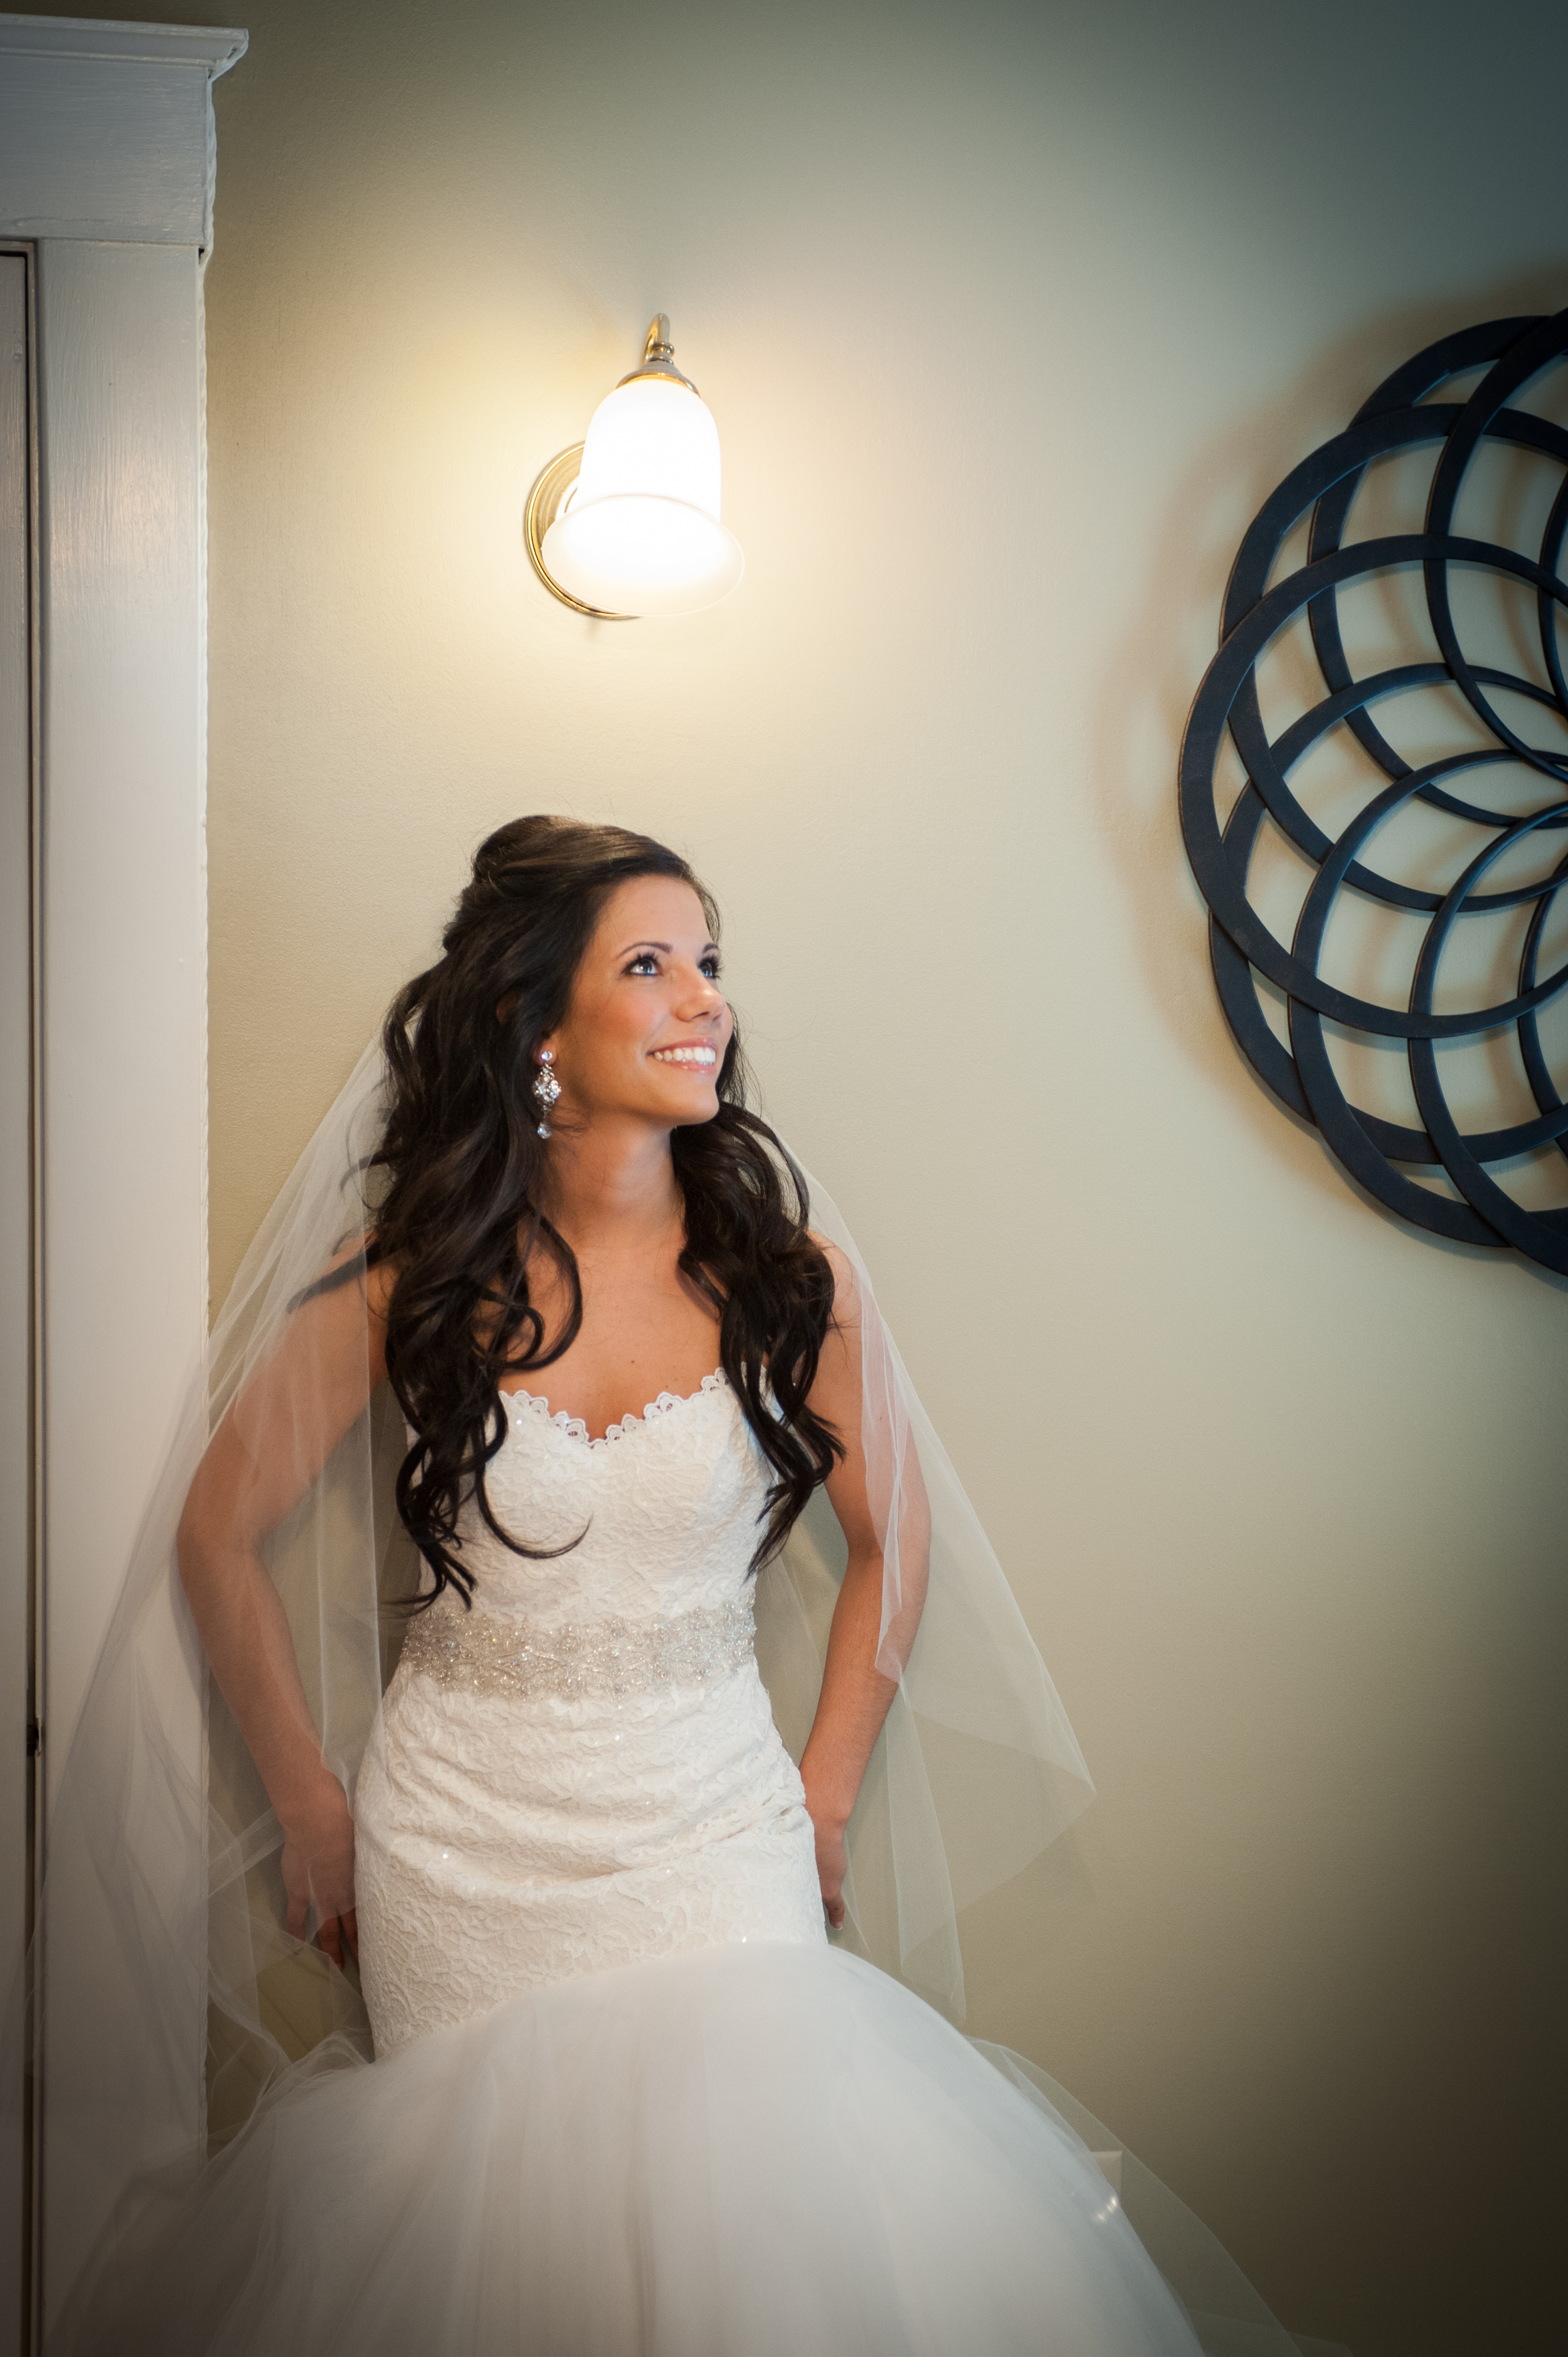 Glowy bridal makeup hair down